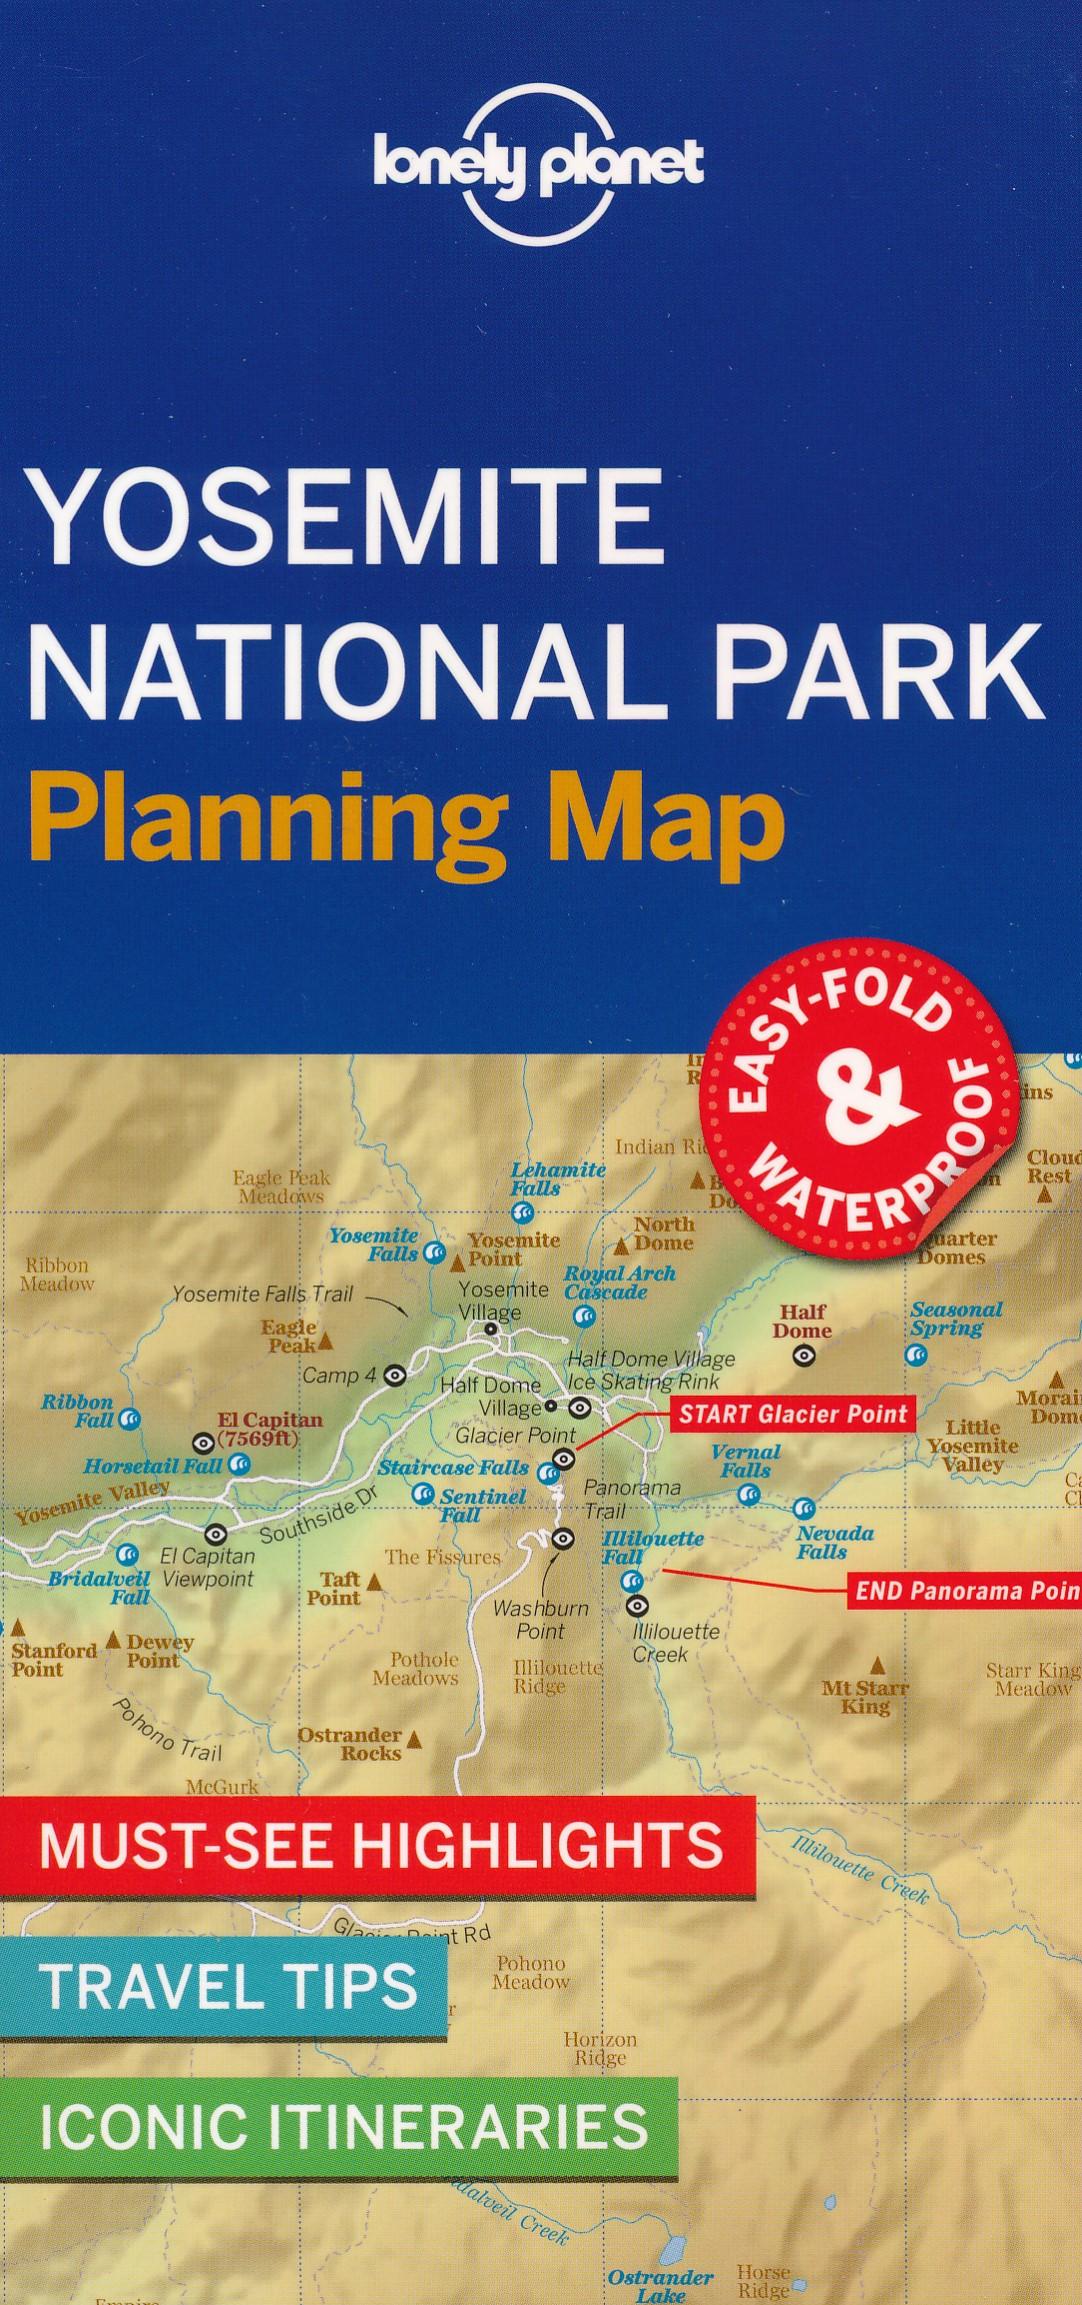 Wegenkaart - landkaart Planning Map Yosemite National Park | Lonely Planet